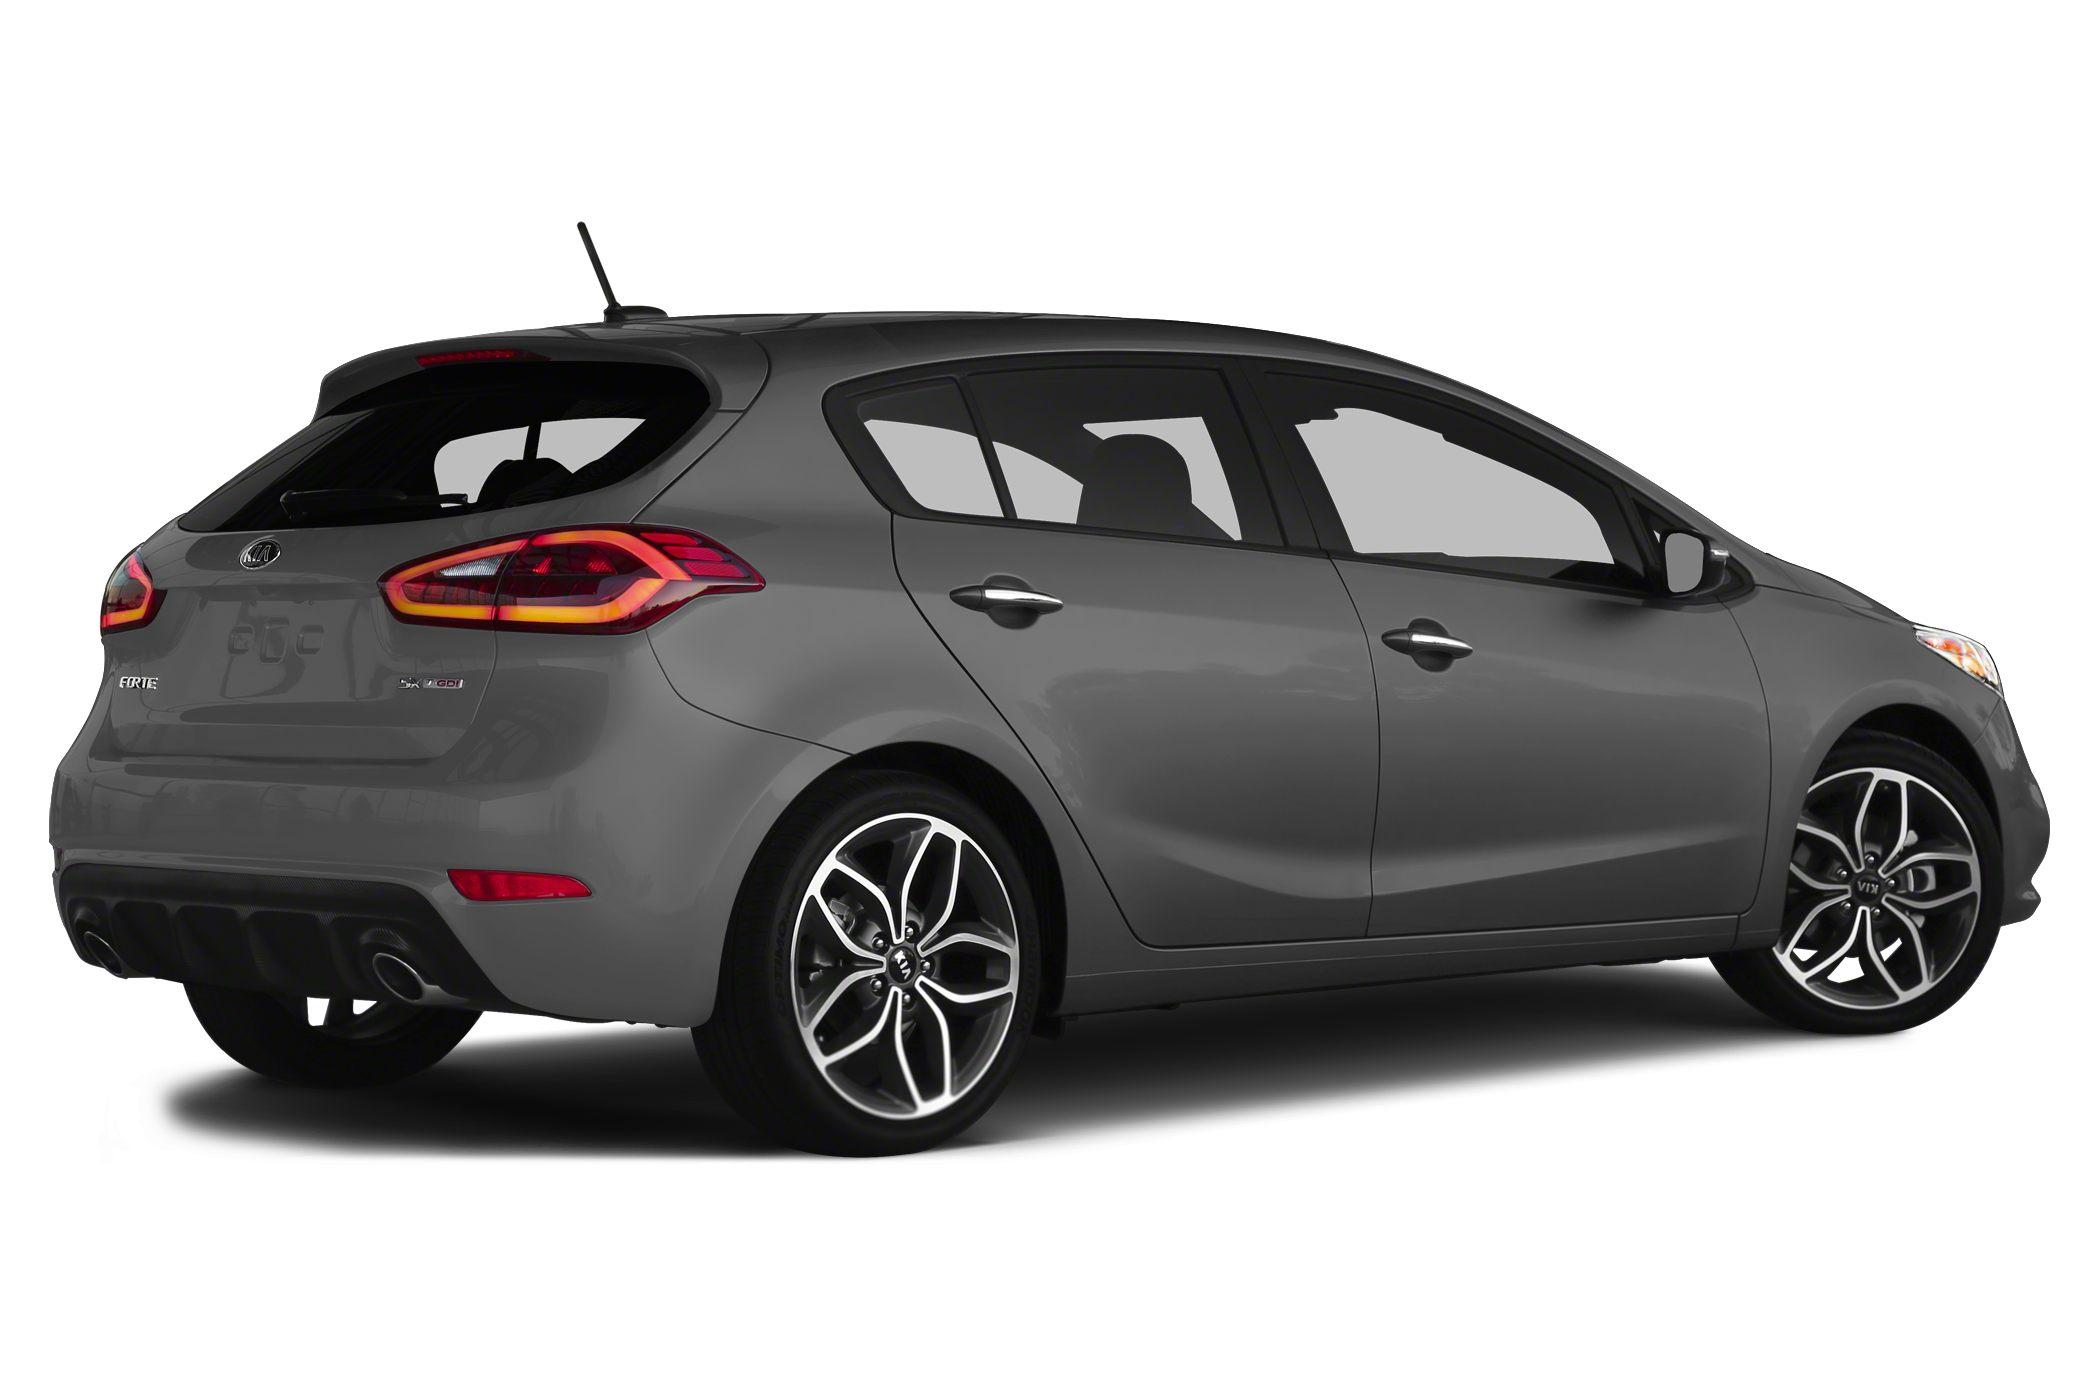 New Kia Forte 3 Widescreen Car Wallpaper